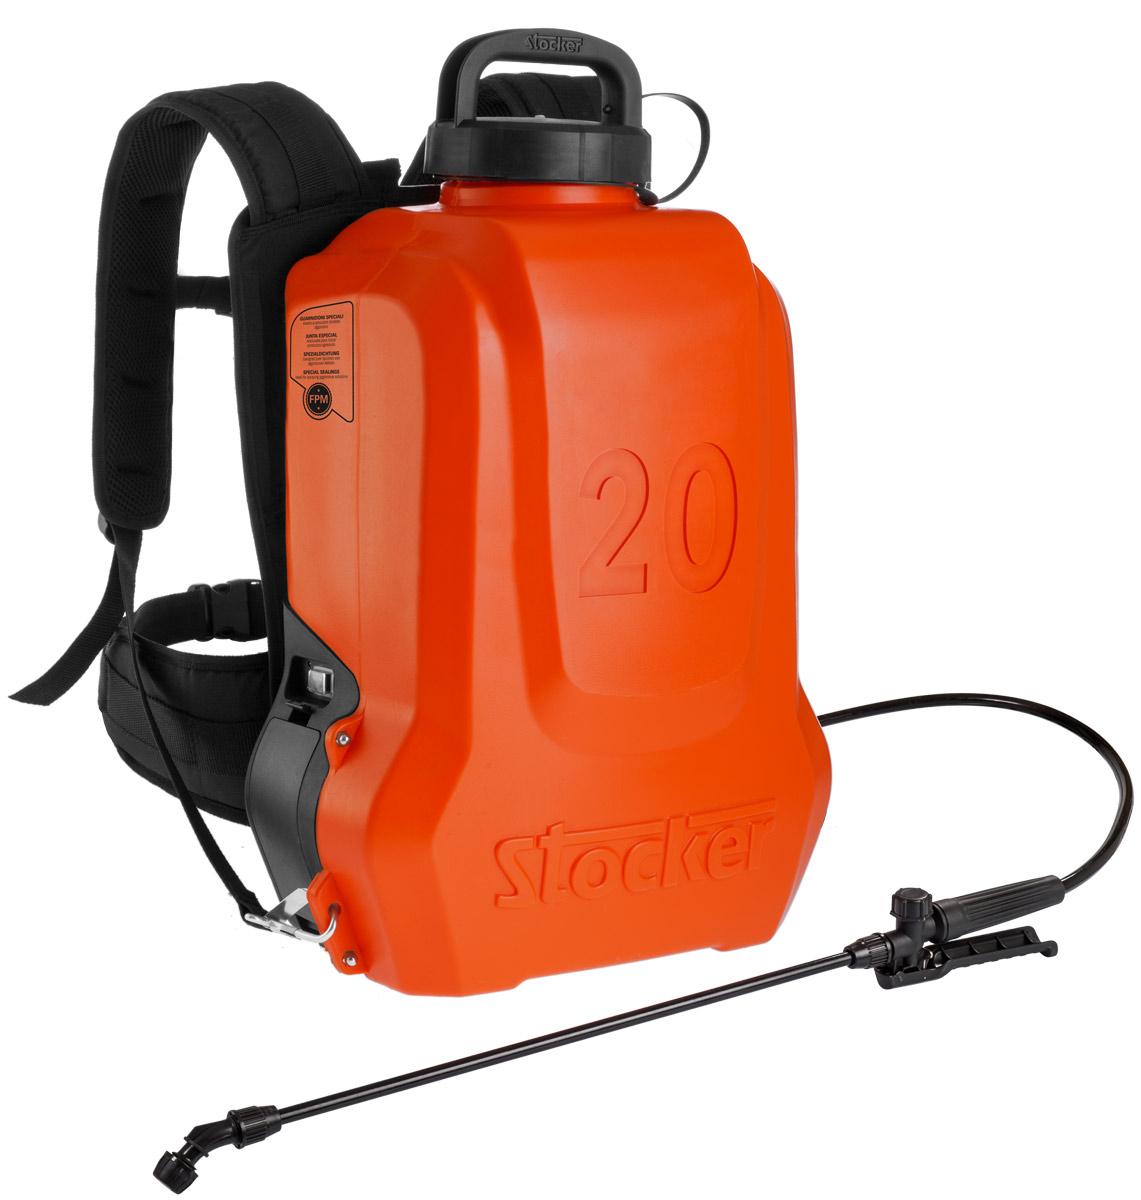 Stocker Pompa zaino elettrica Ergo20 l Li-Ion FPM 5bar